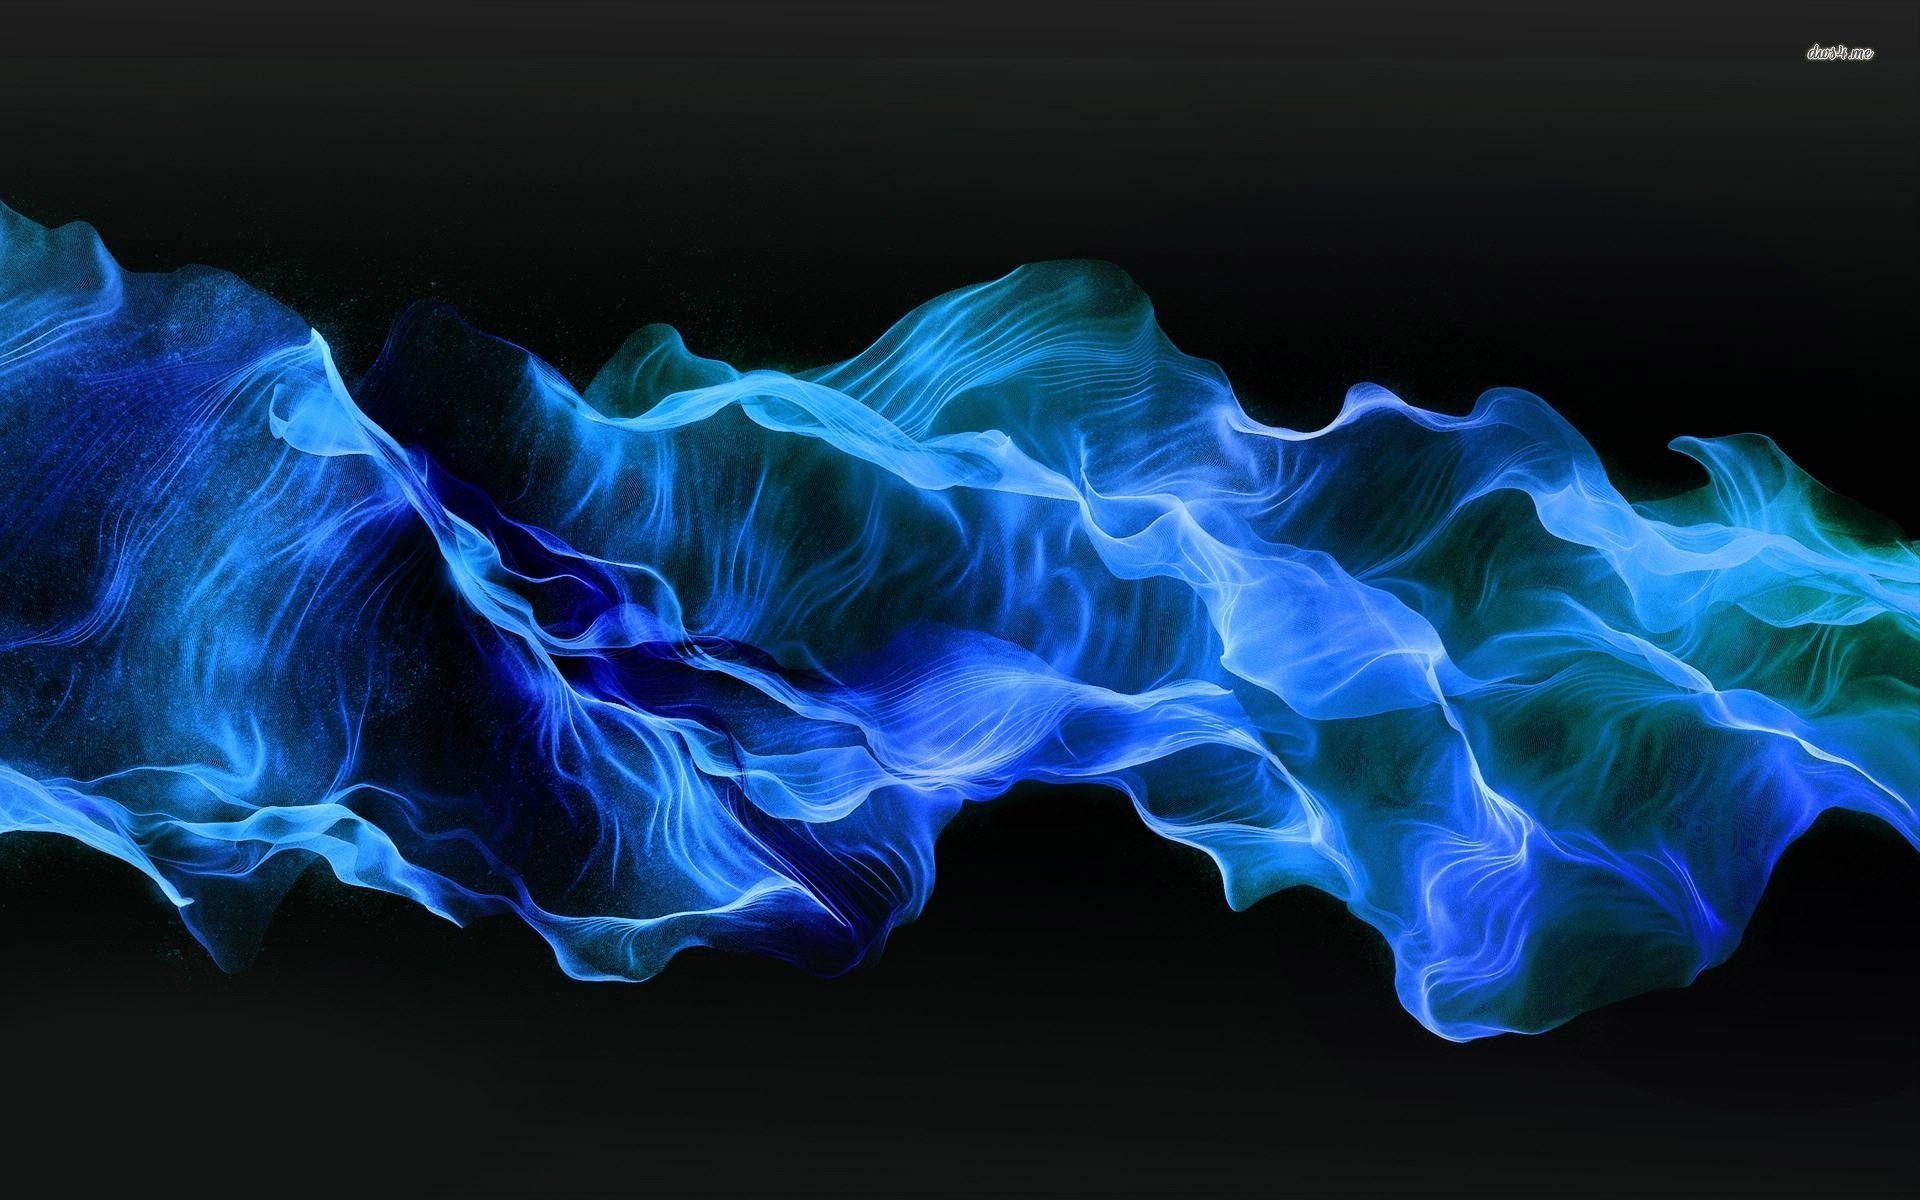 Blue Smoke Wallpapers - Wallpaper Cave